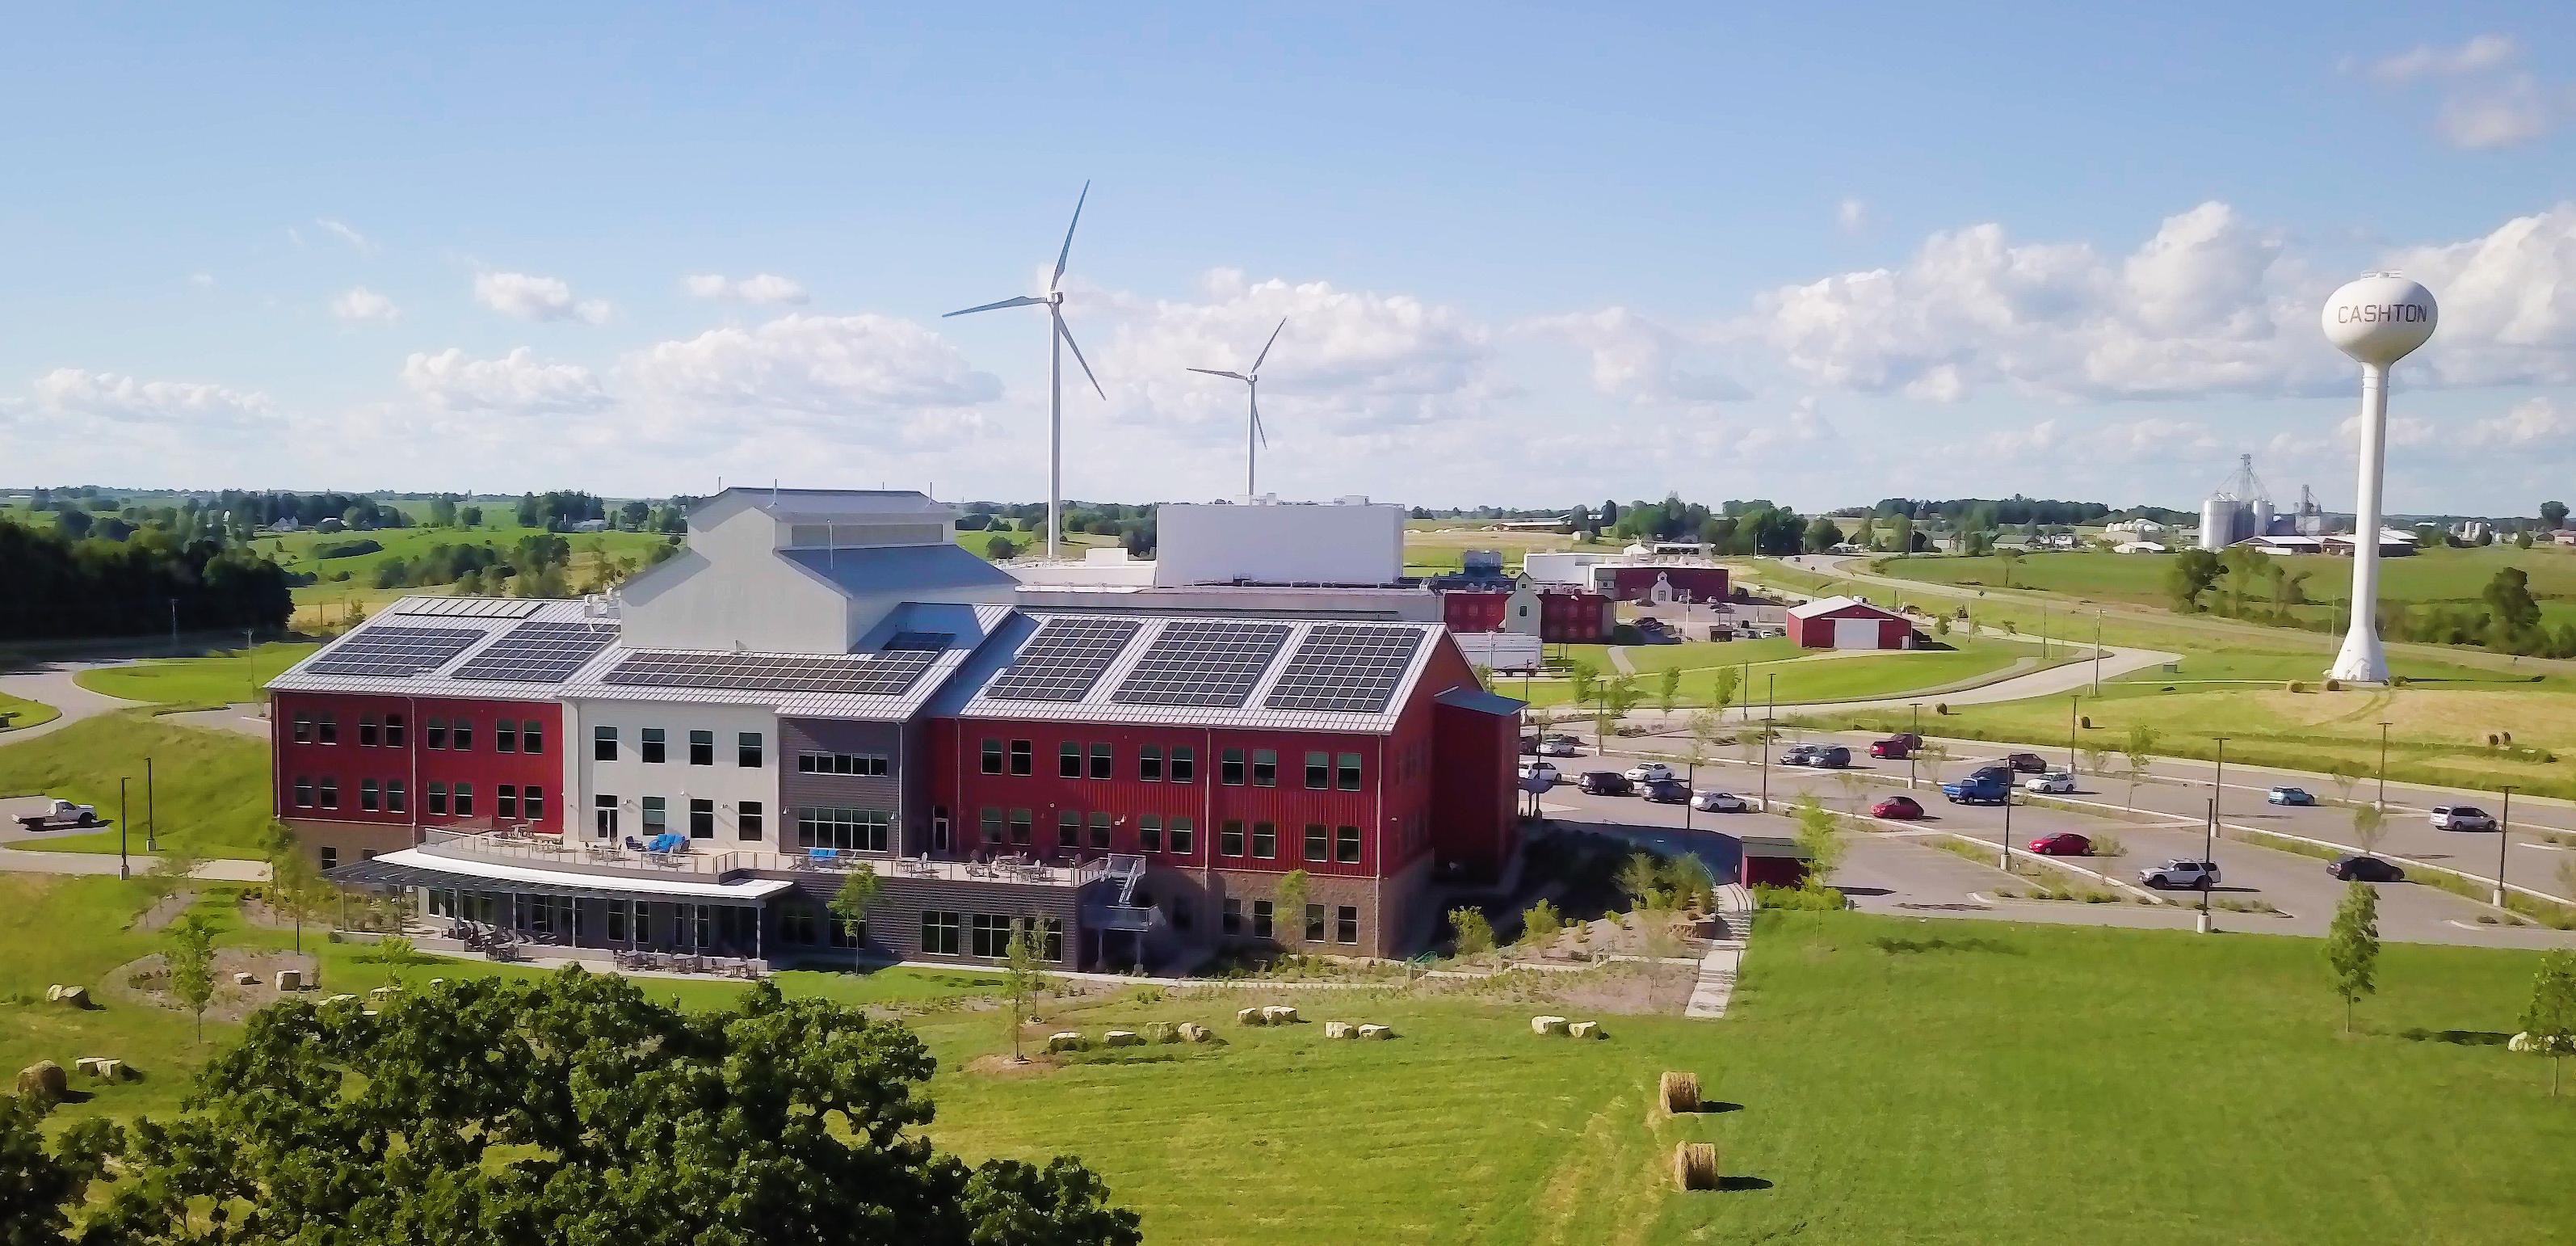 Organic Valley Goes 100% Renewable through Community Solar